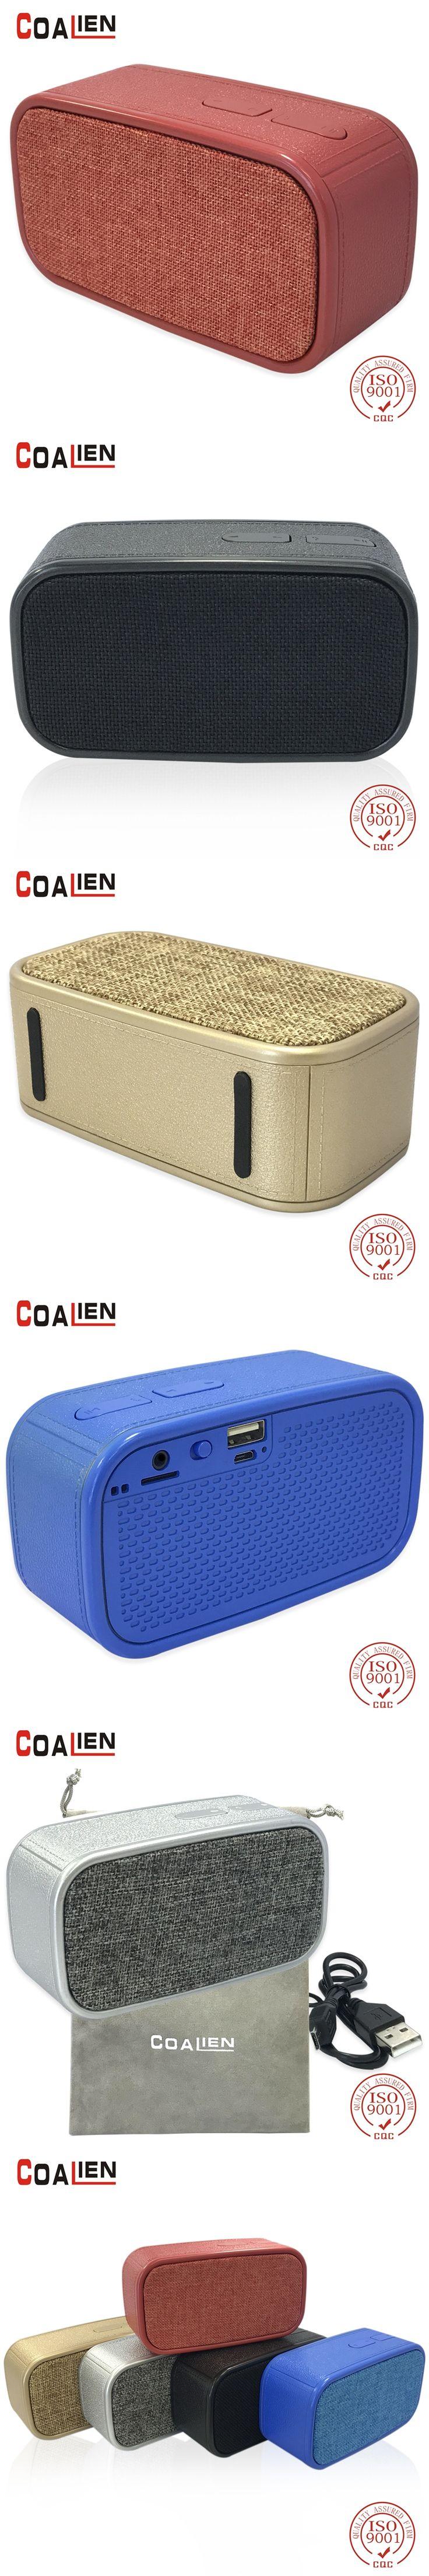 Bluetooth Speaker Wireless Portable HIFI Mini Speaker Home Theater High Quality Bluetooth Handsfree TF FM Radio Music Speaker